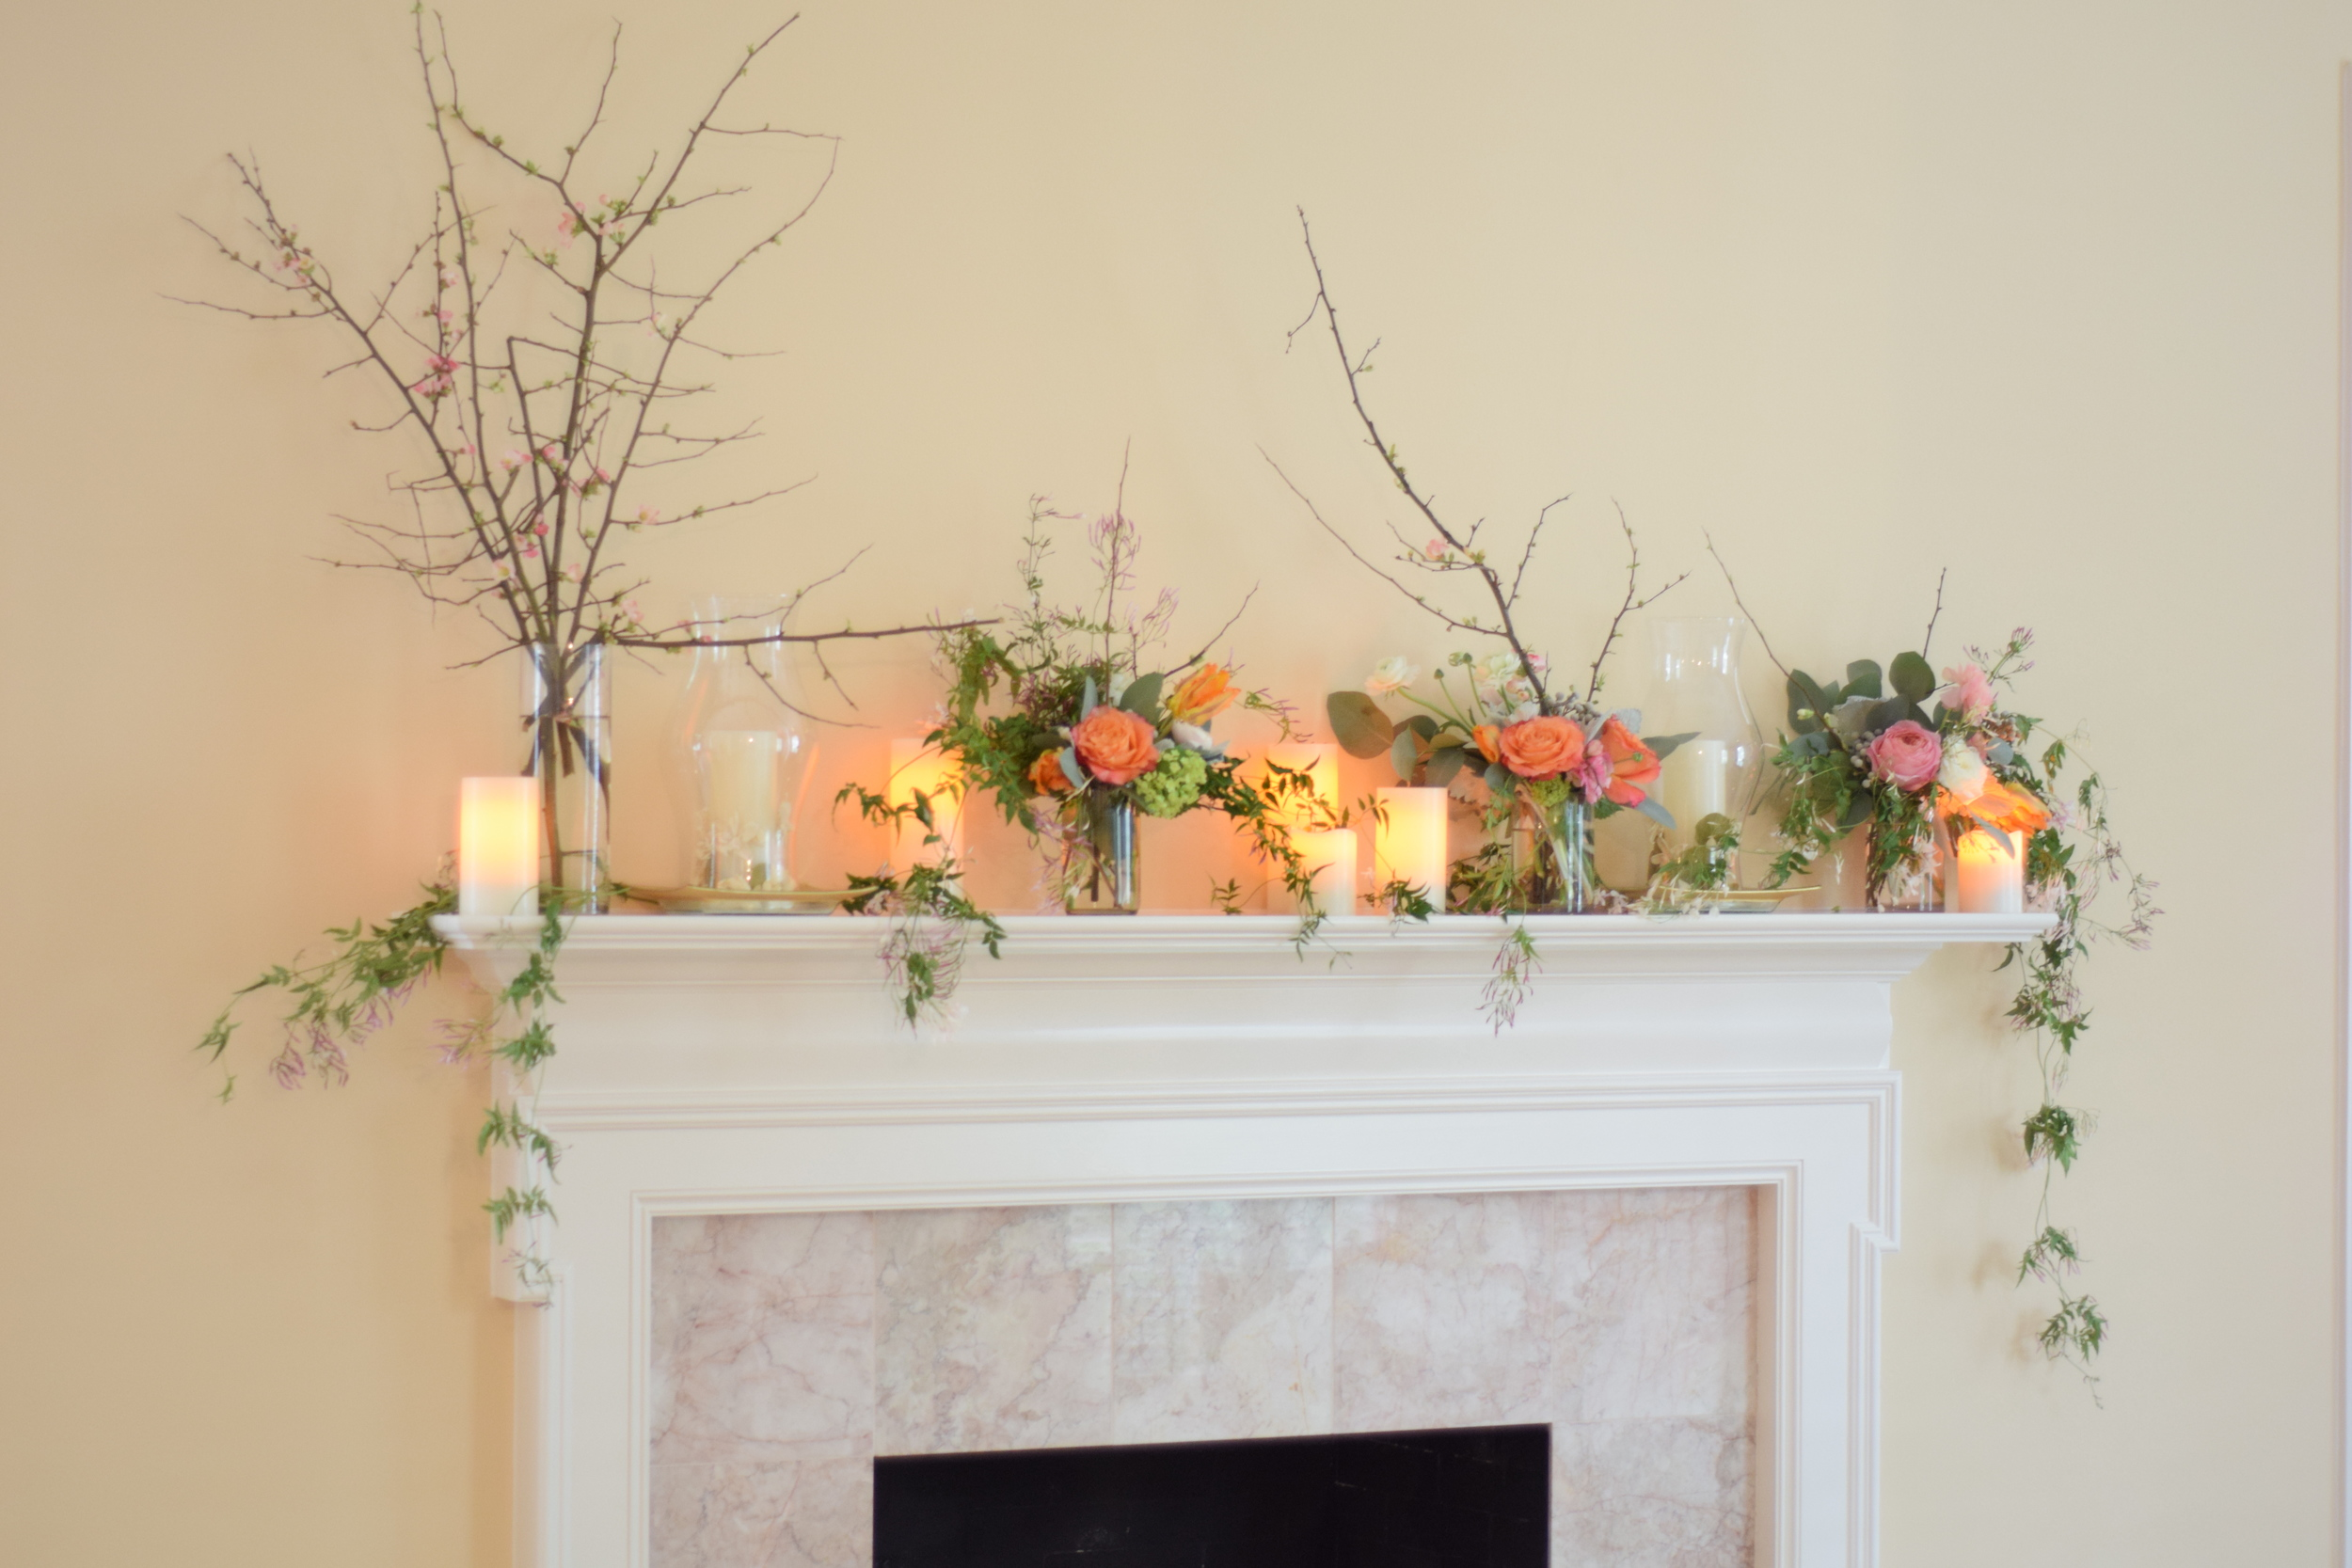 Fireplace Mantel Flowers, Maxit Flower Design